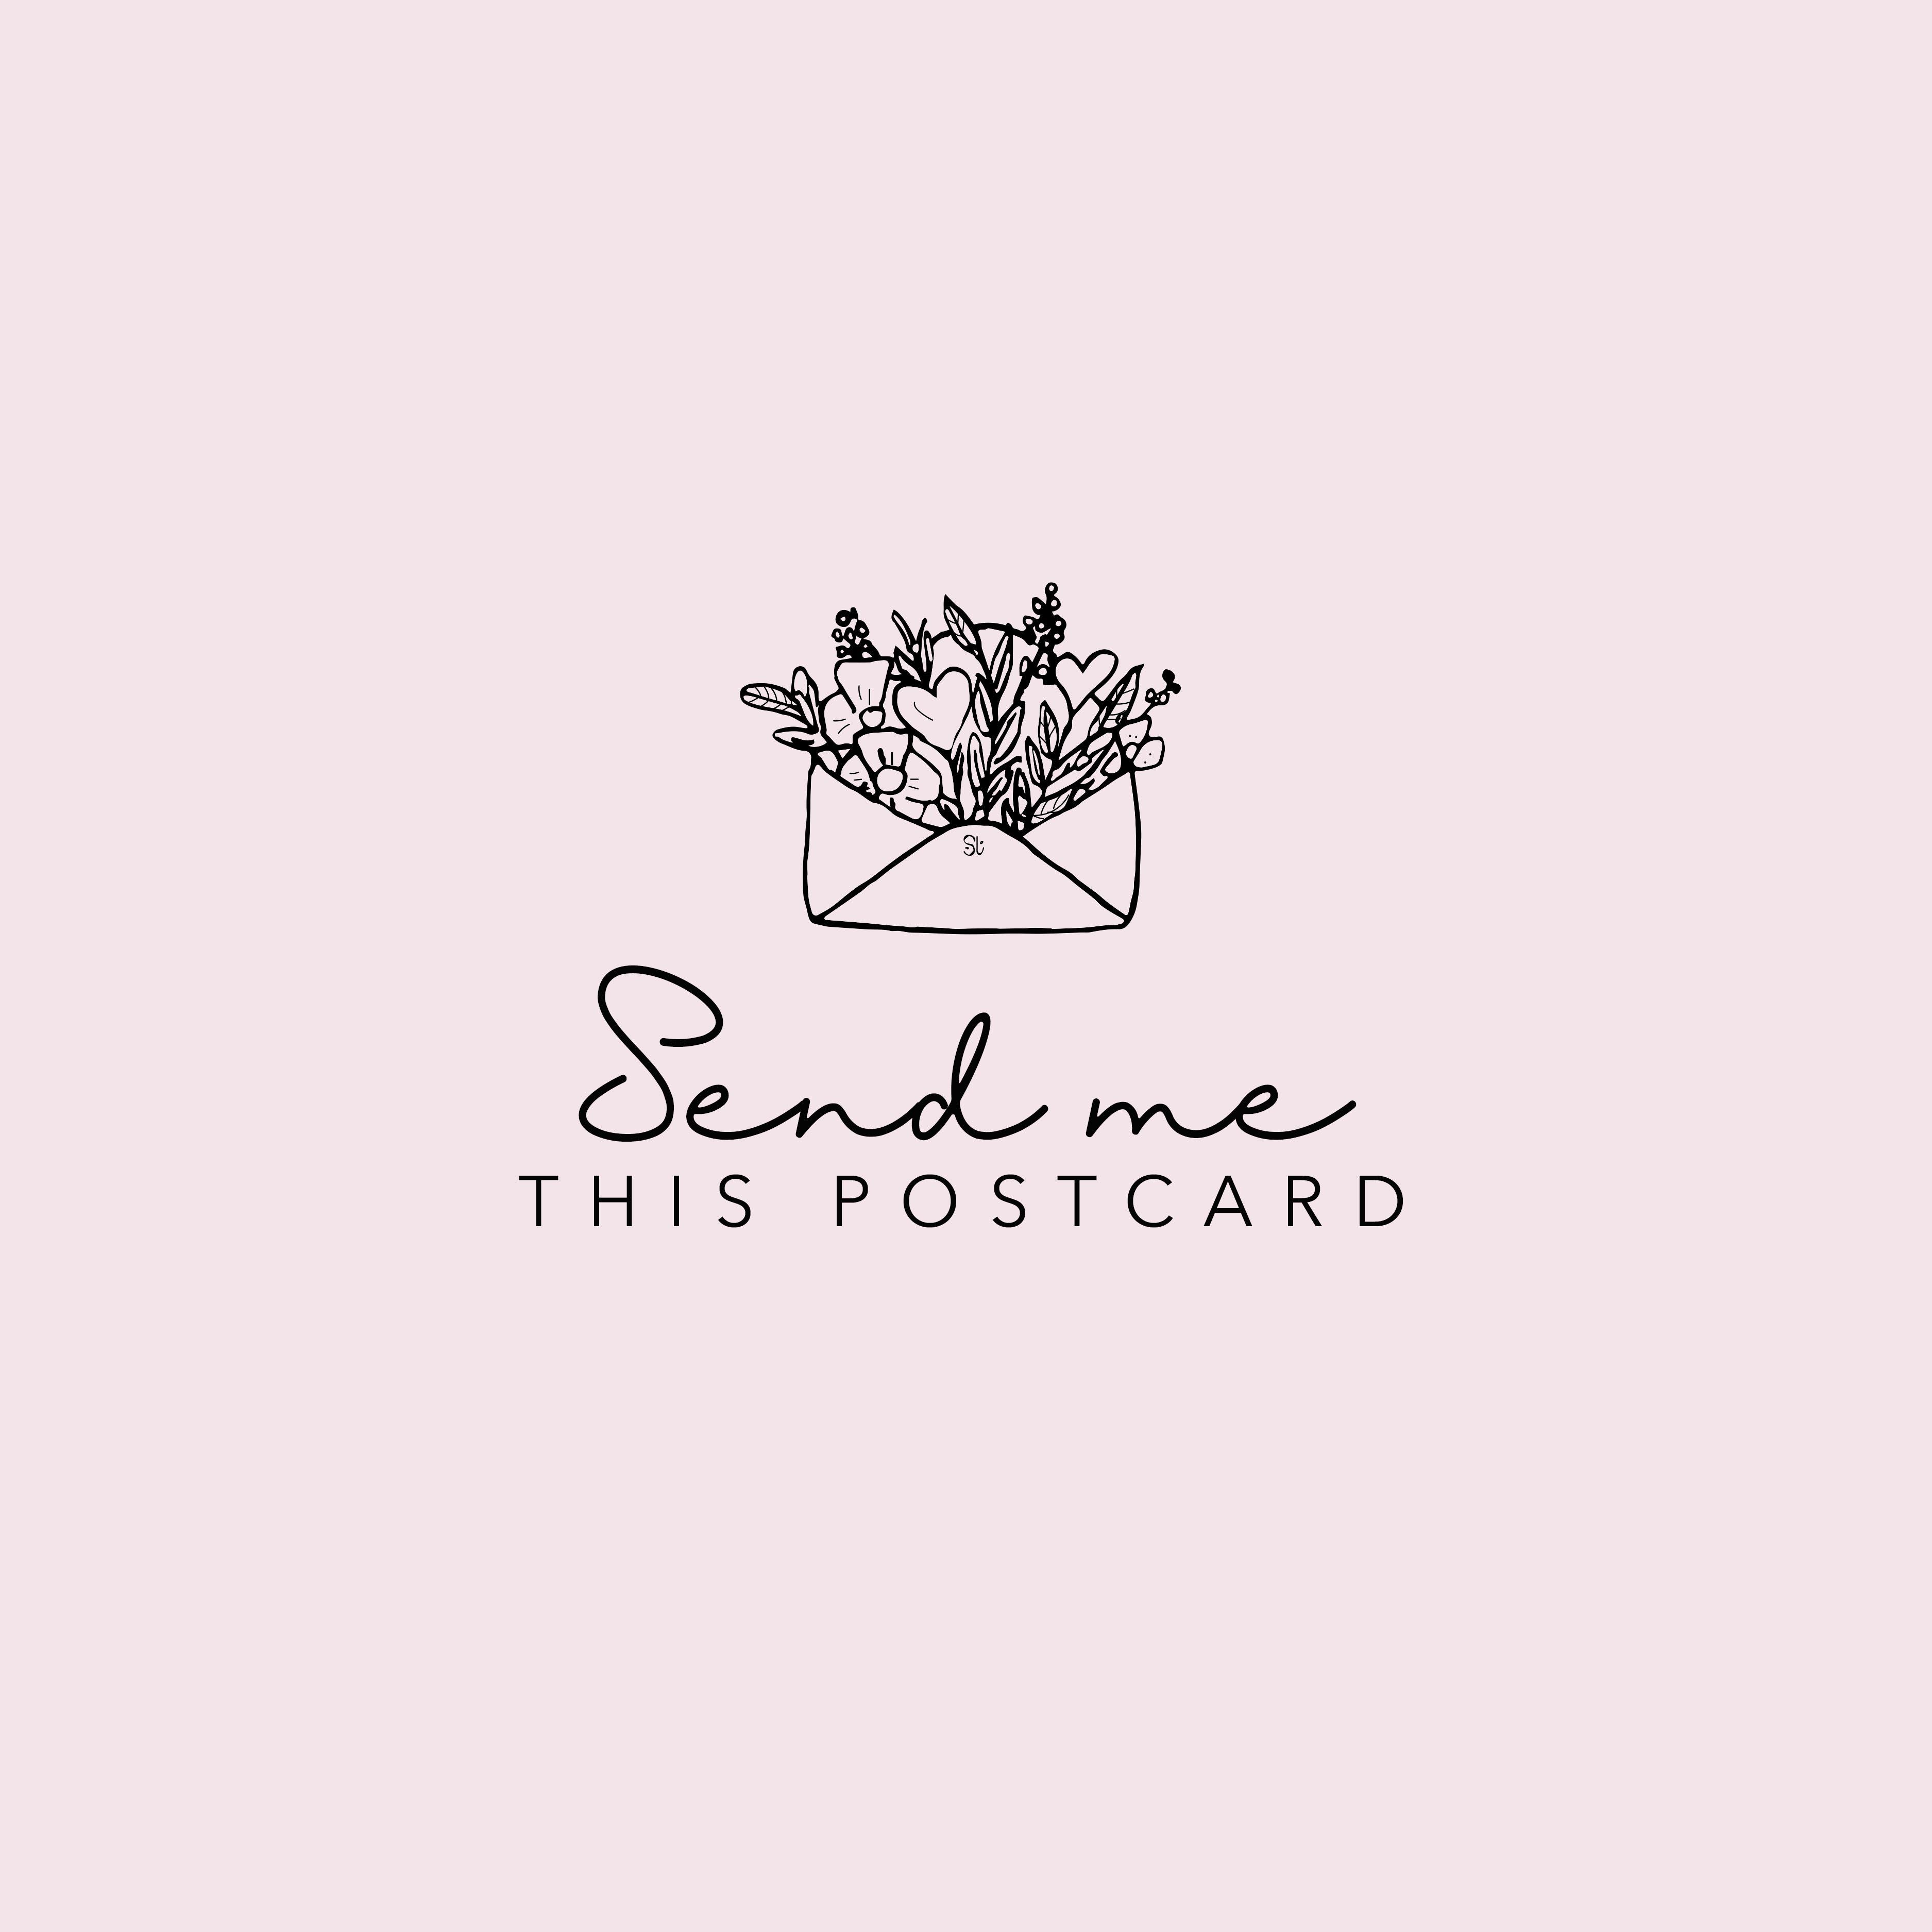 Send me this postcard